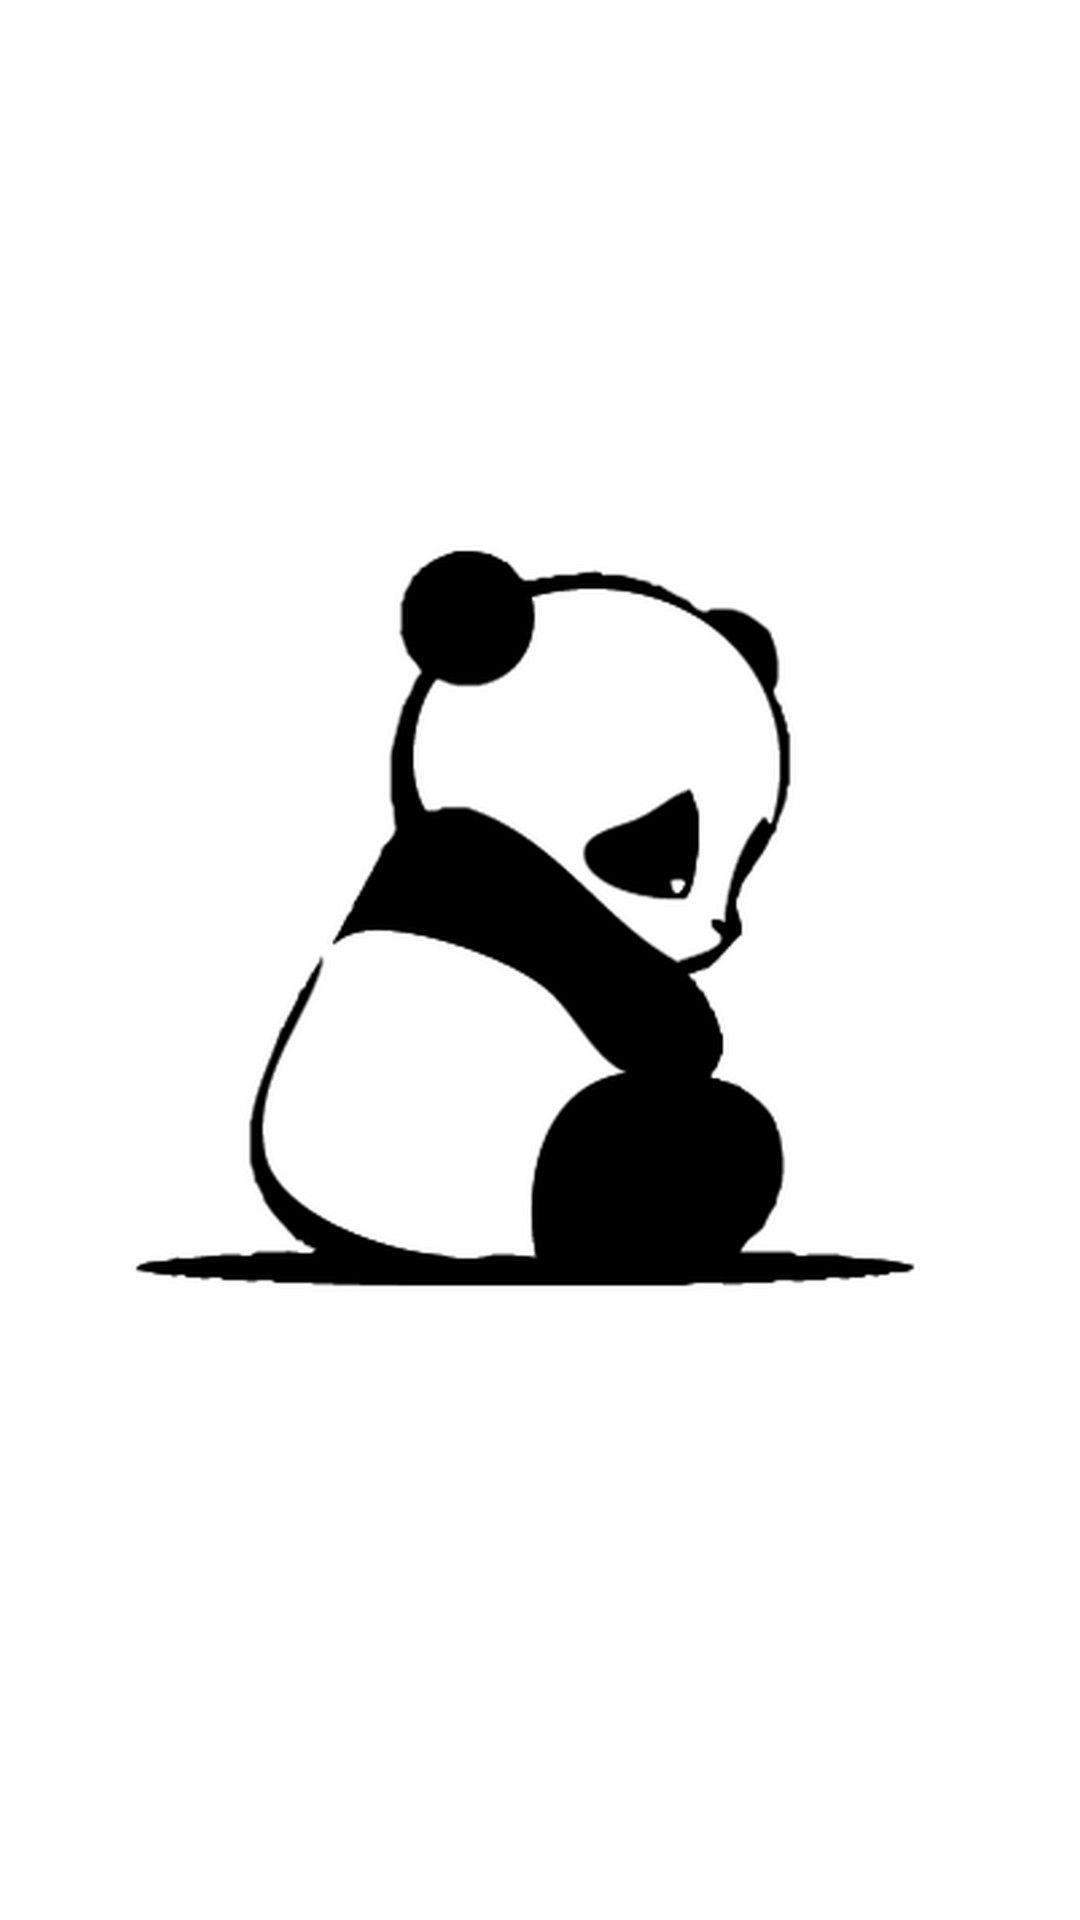 Kawaii Cute Baby Panda Wallpaper Animated Http Wallpapersalbum Com Kawaii Cute Baby Panda Wallpaper Anima In 2020 Cute Panda Wallpaper Panda Drawing Panda Wallpapers